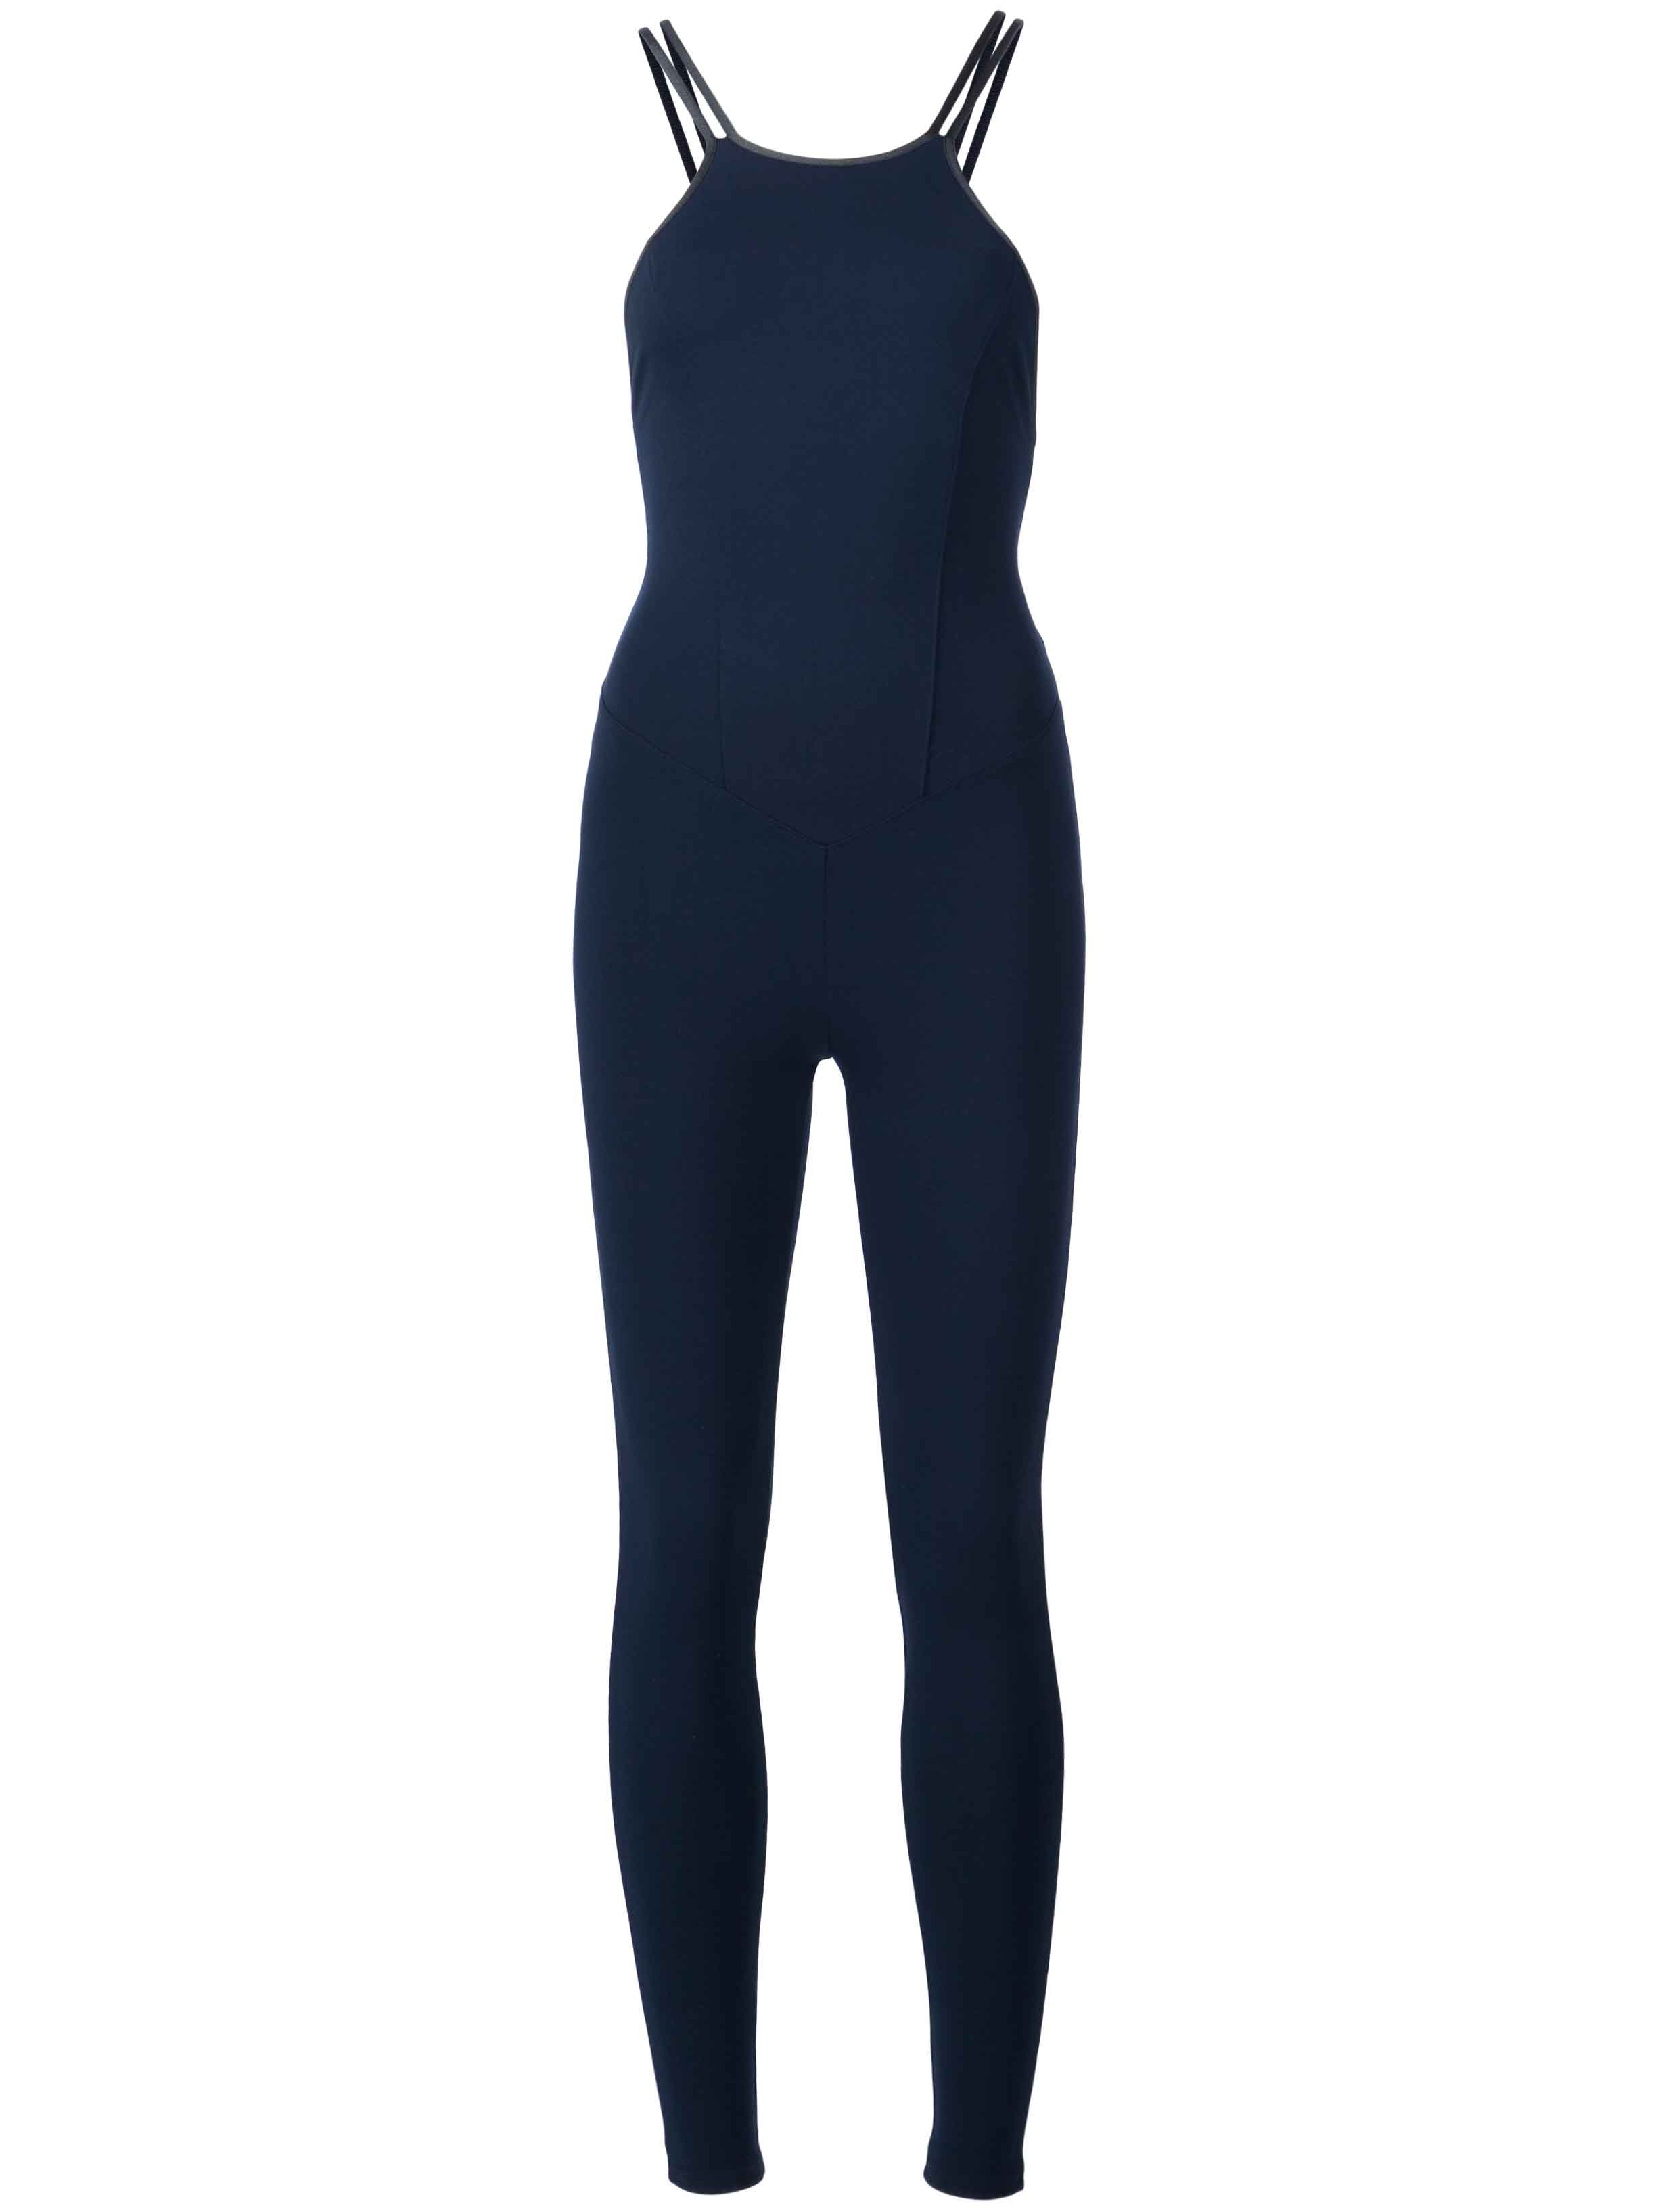 R Farfetch x Chelsea Leyland Live The Process Bodysuit